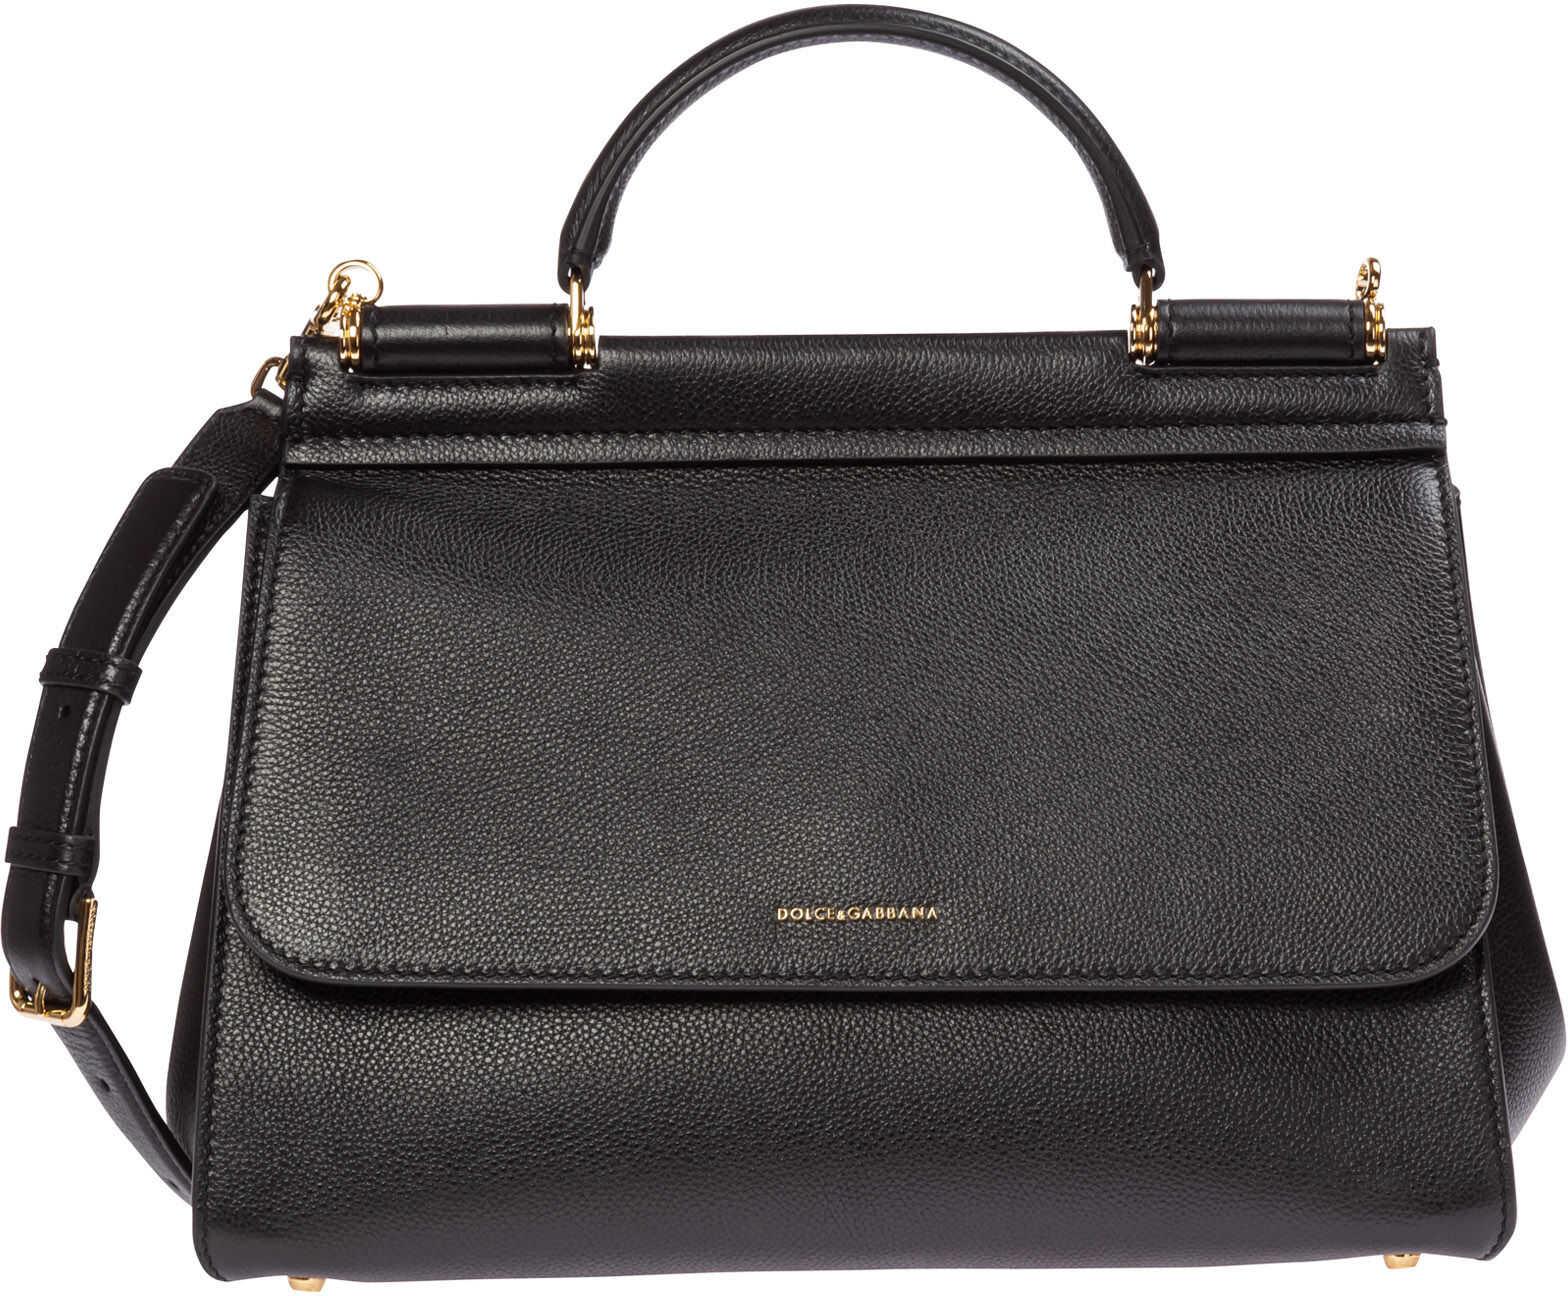 Dolce & Gabbana Sicily Soft Black